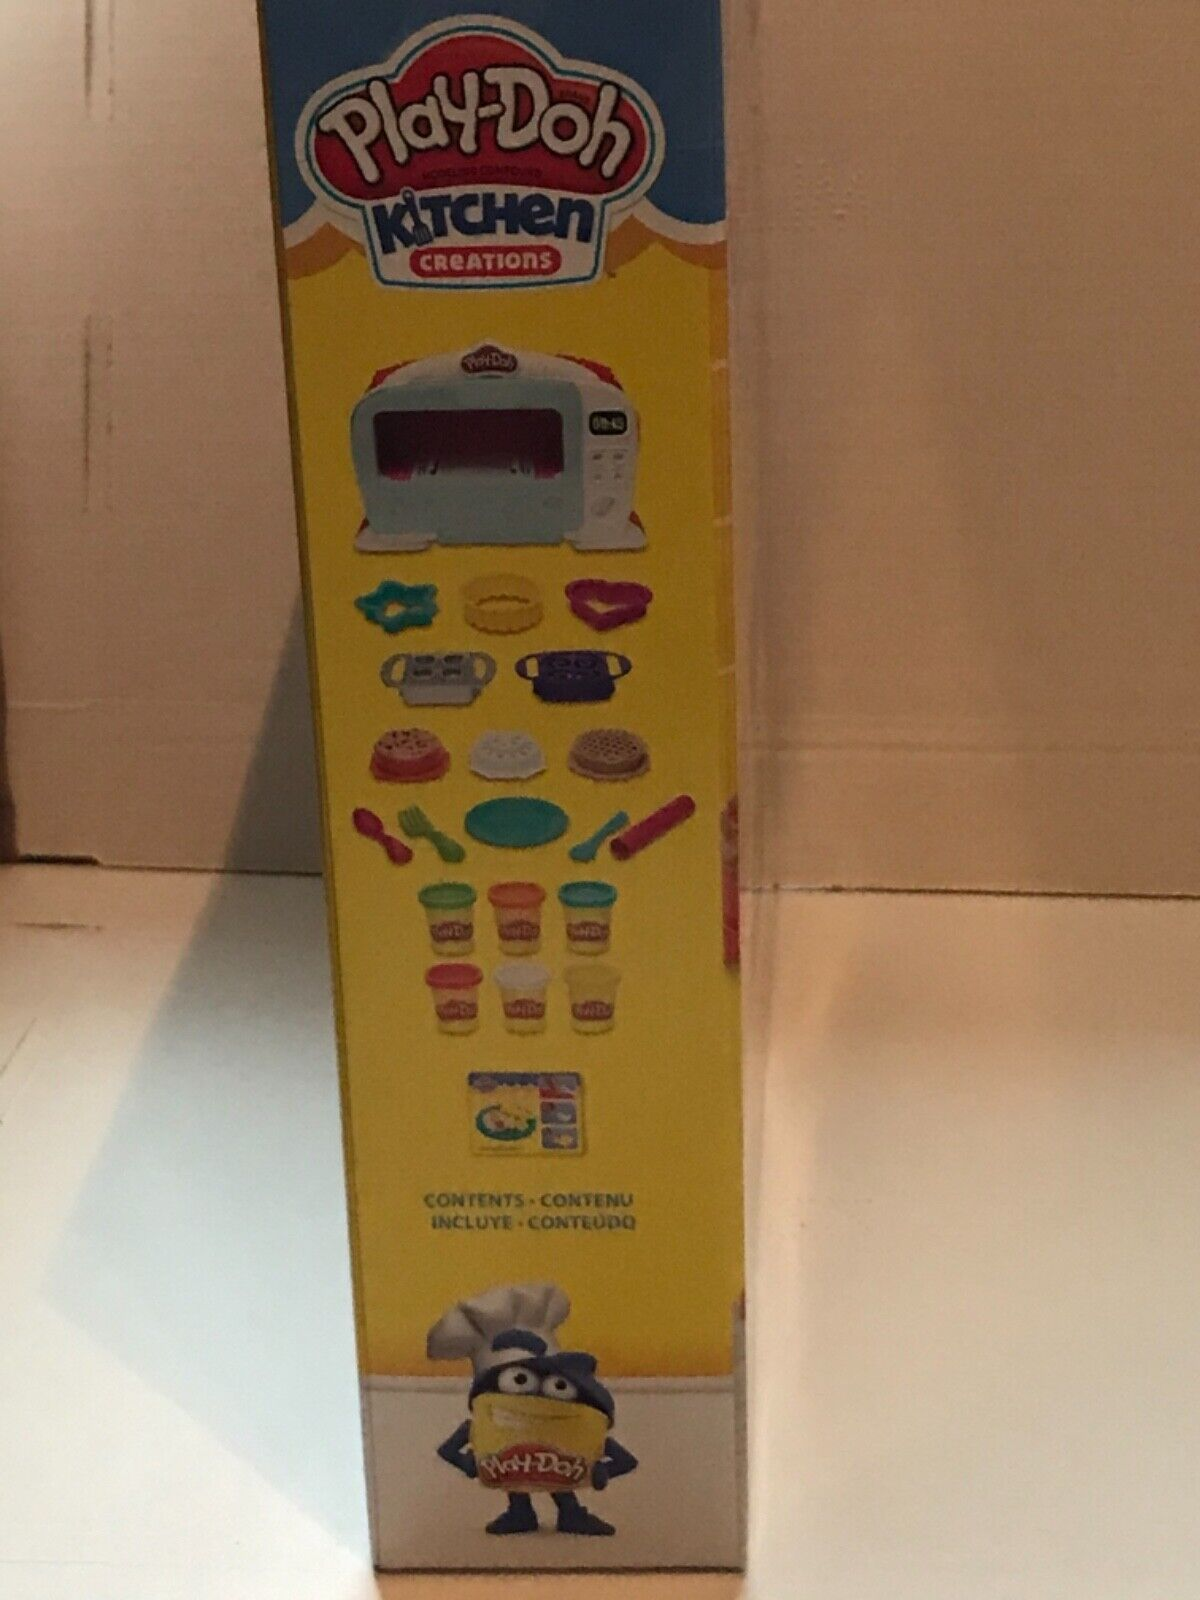 Kupit Play Doh Kitchen Creations Magical Oven B9740 Na Aukcion Iz Ameriki S Dostavkoj V Rossiyu Ukrainu Kazahstan